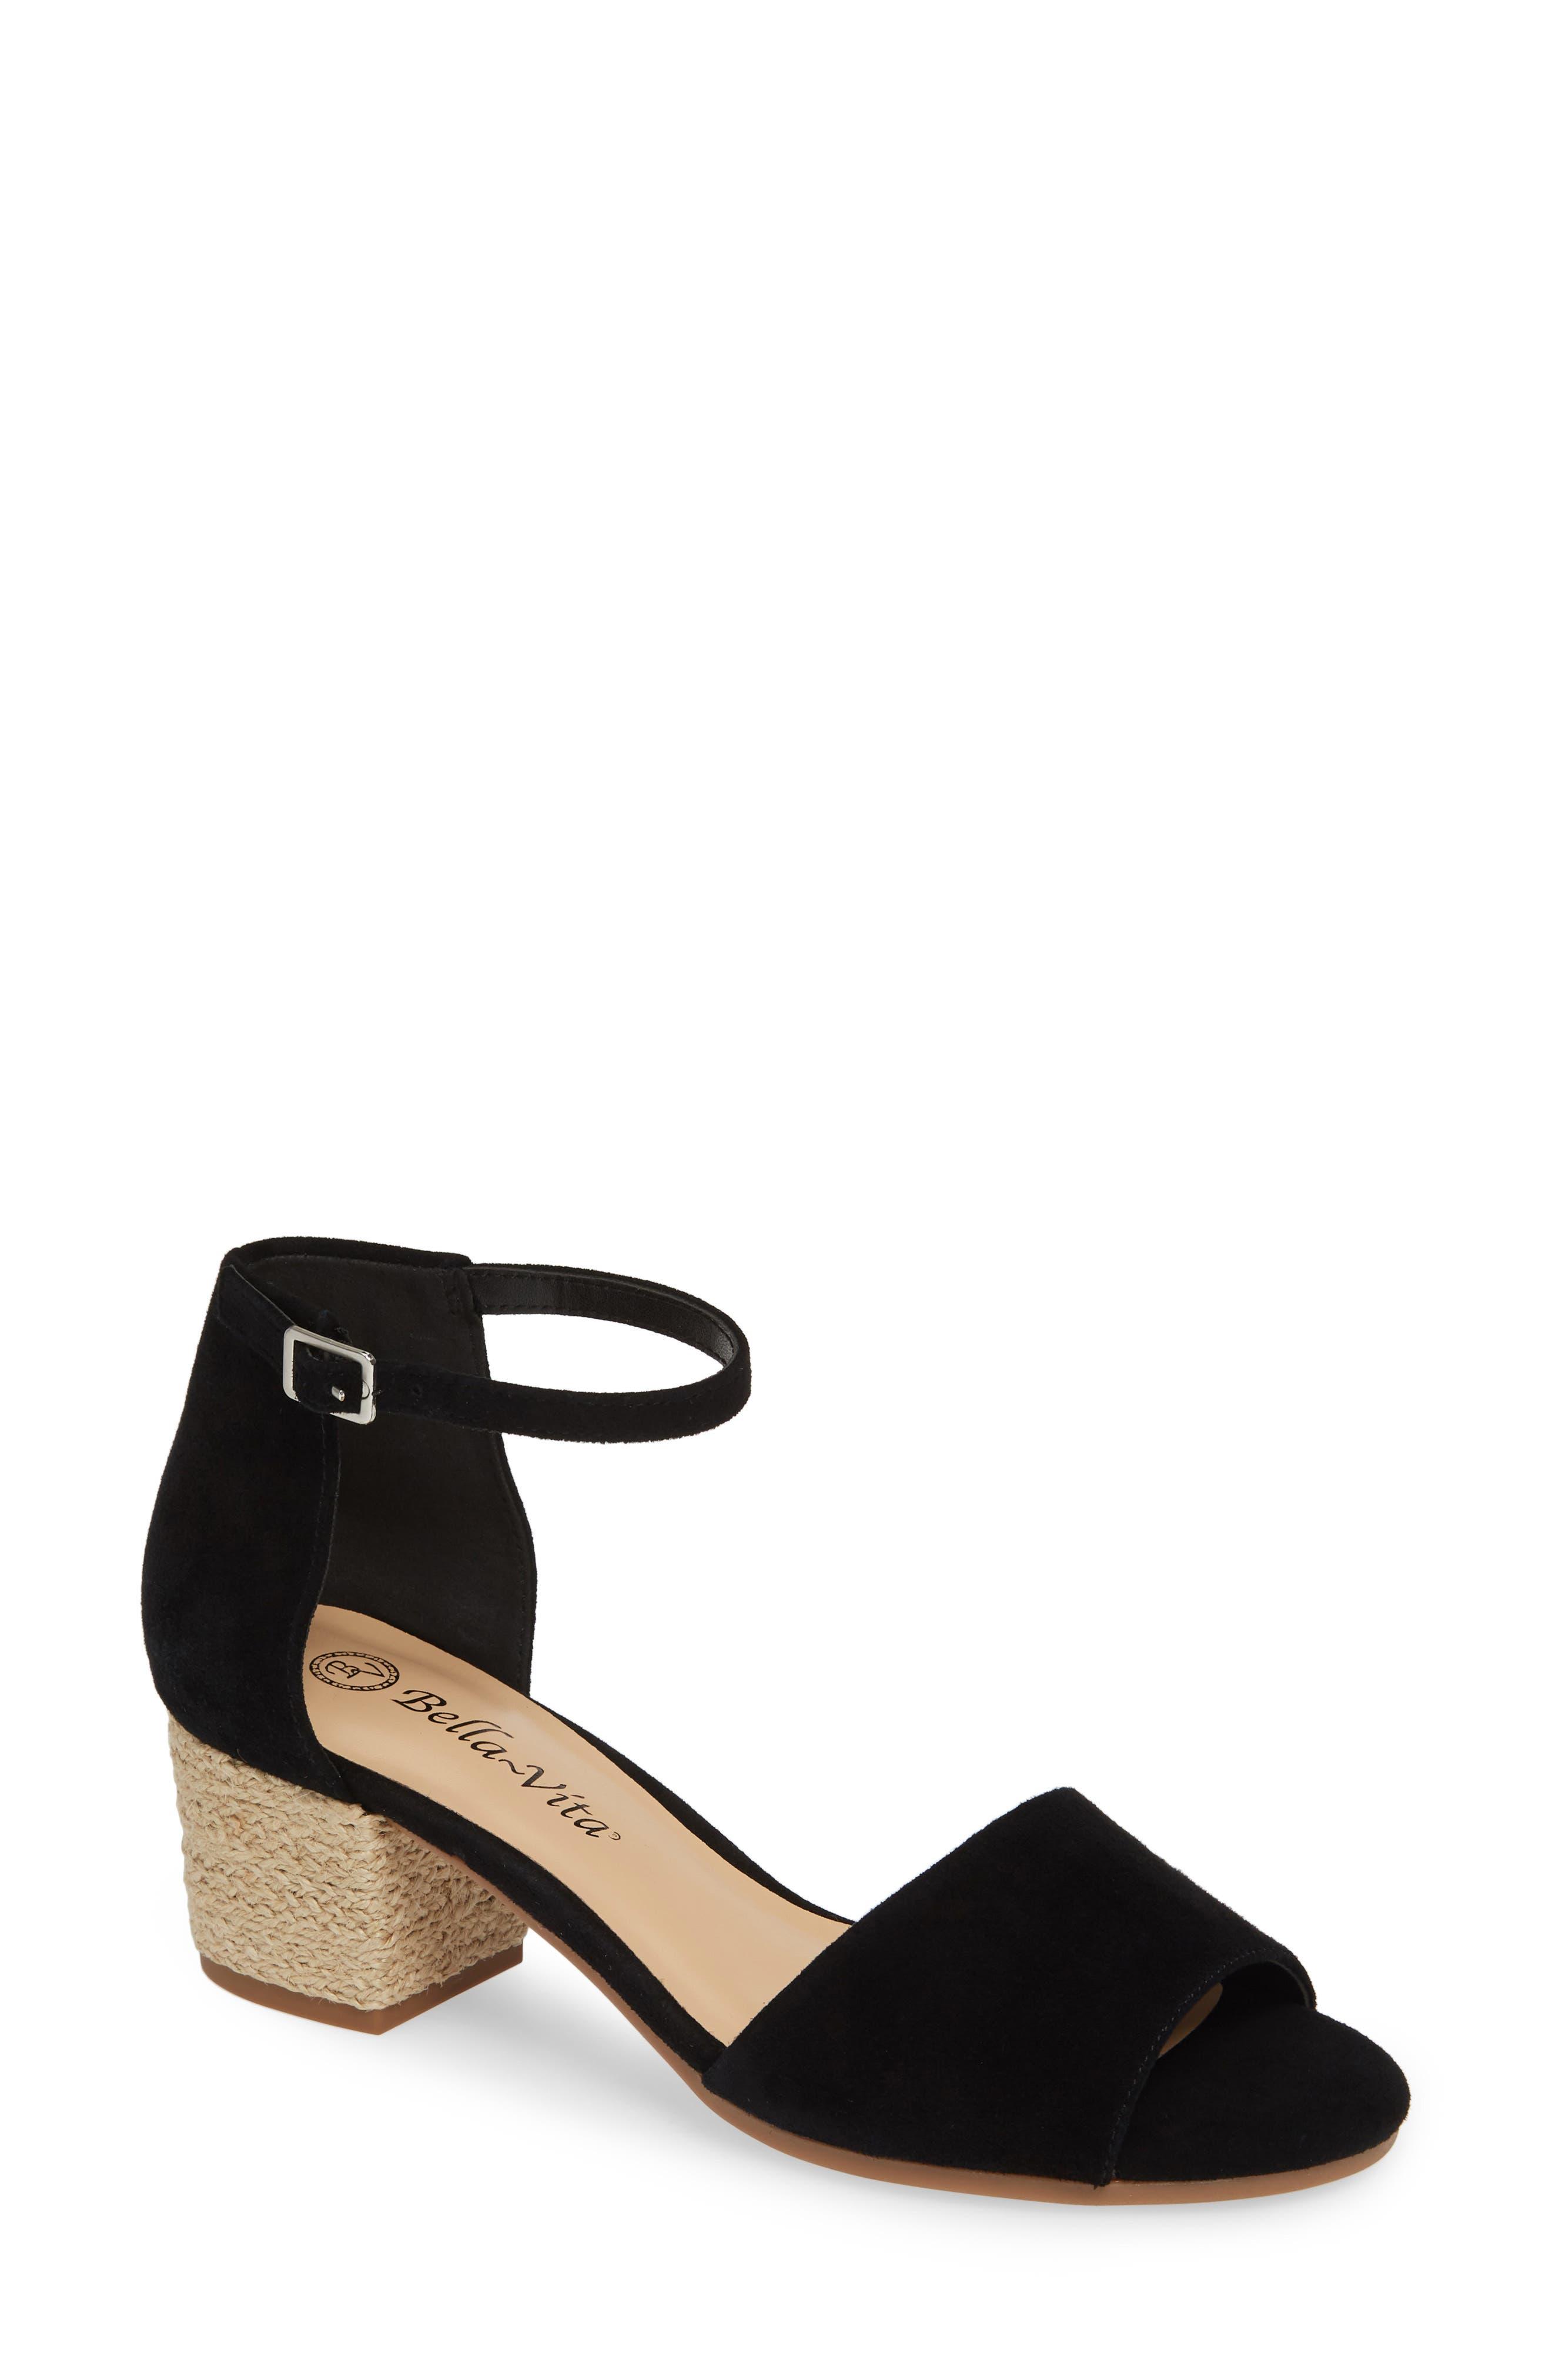 BELLA VITA Fable Sandal, Main, color, BLACK SUEDE